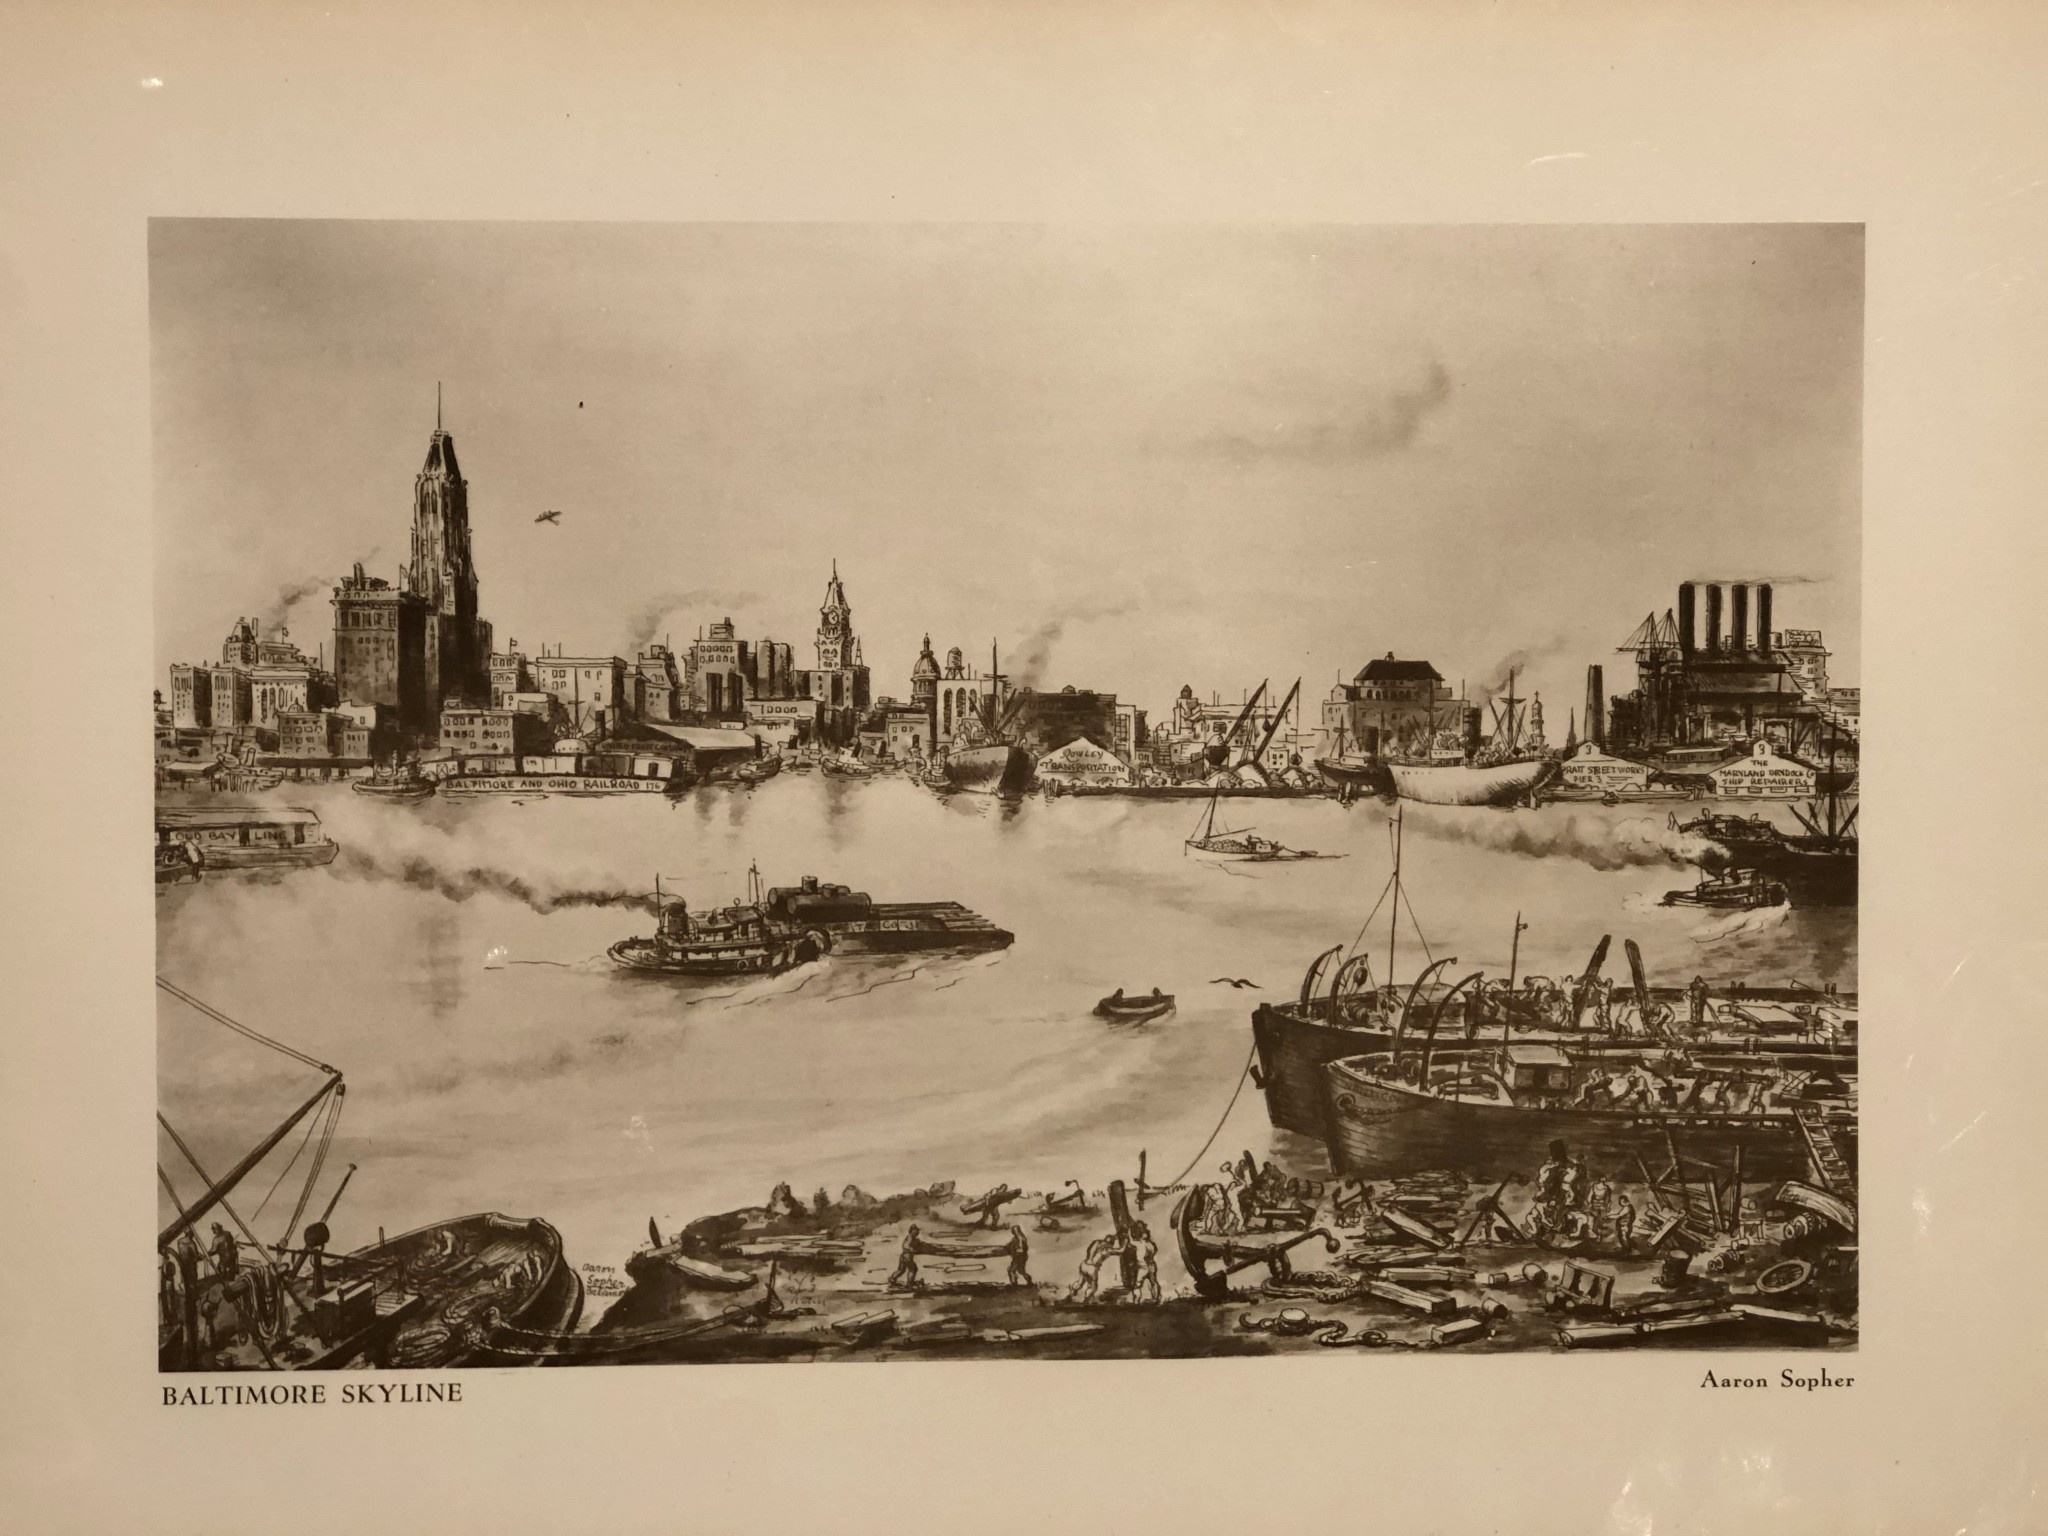 Baltimore Skyline by Aaron Sopher, Matte Print